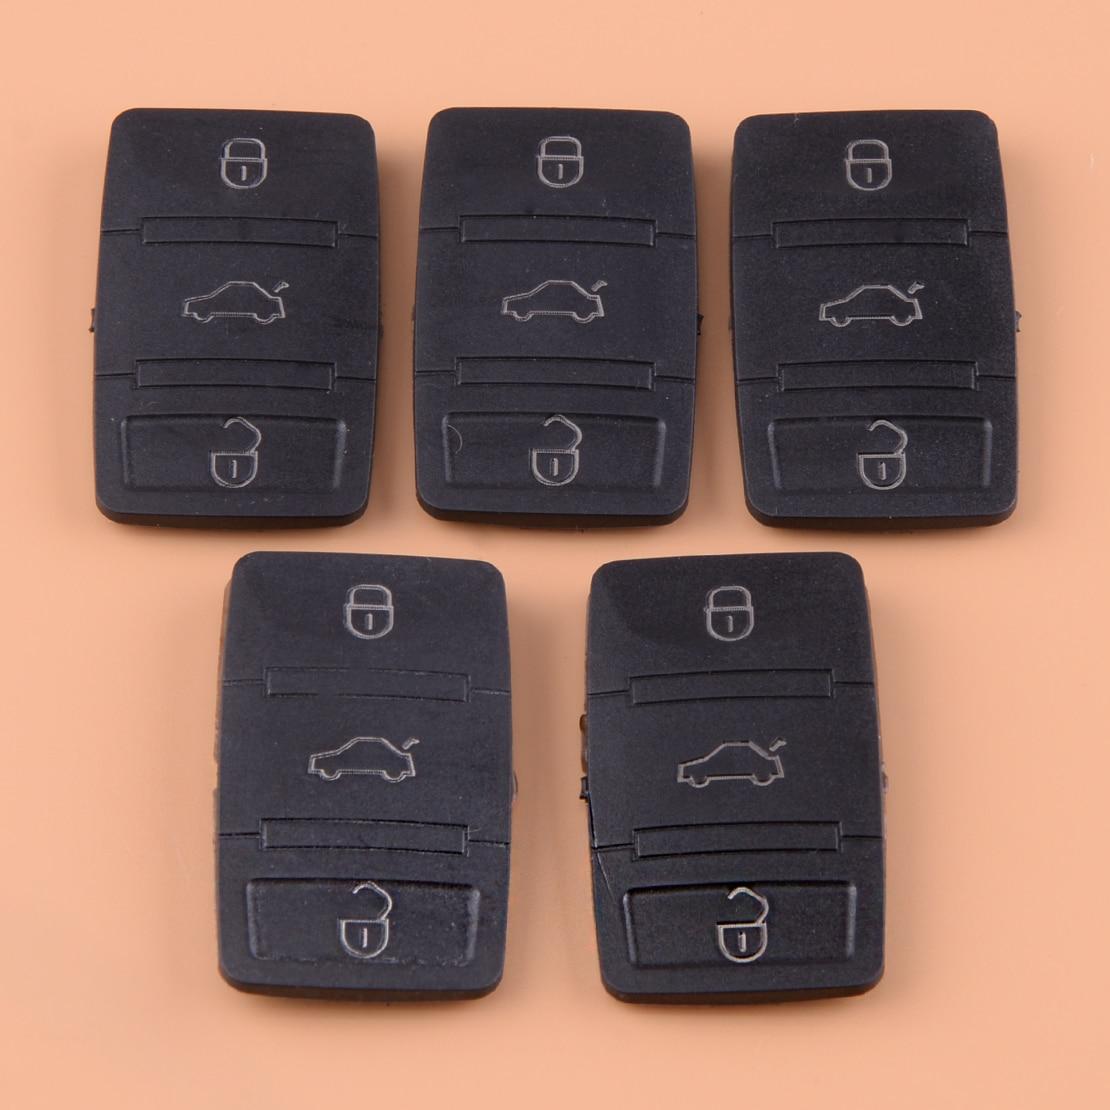 DWCX 5 uds Botón de tecla remota de goma negra, carcasa de repuesto para VW Tiguan, Beetle Jetta Skoda Octavia Seat Leon Altea